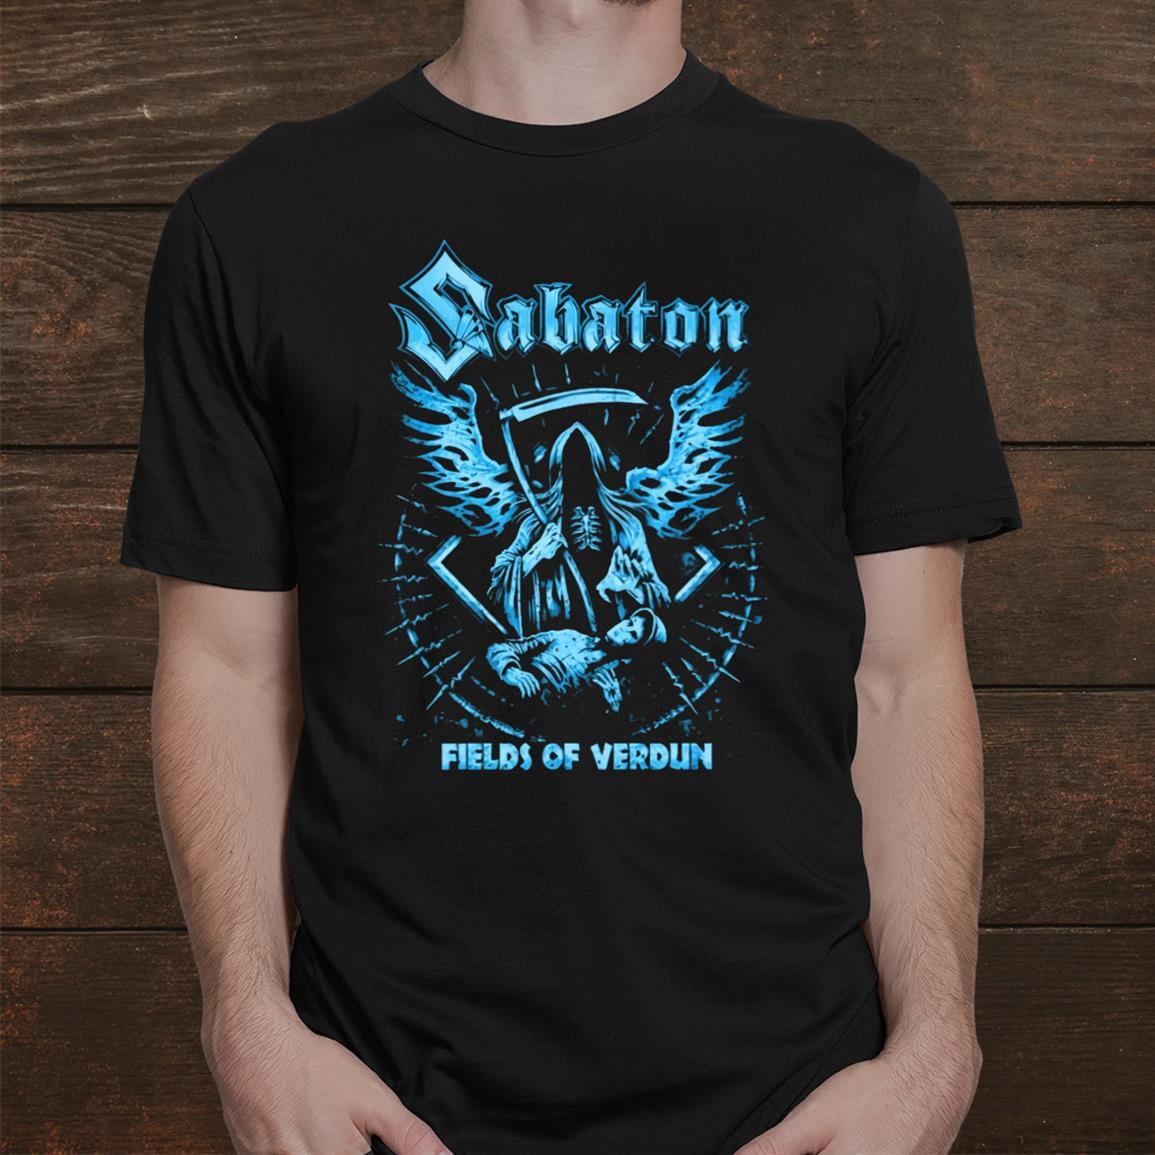 Sabaton Fields Of Verdun Shirt